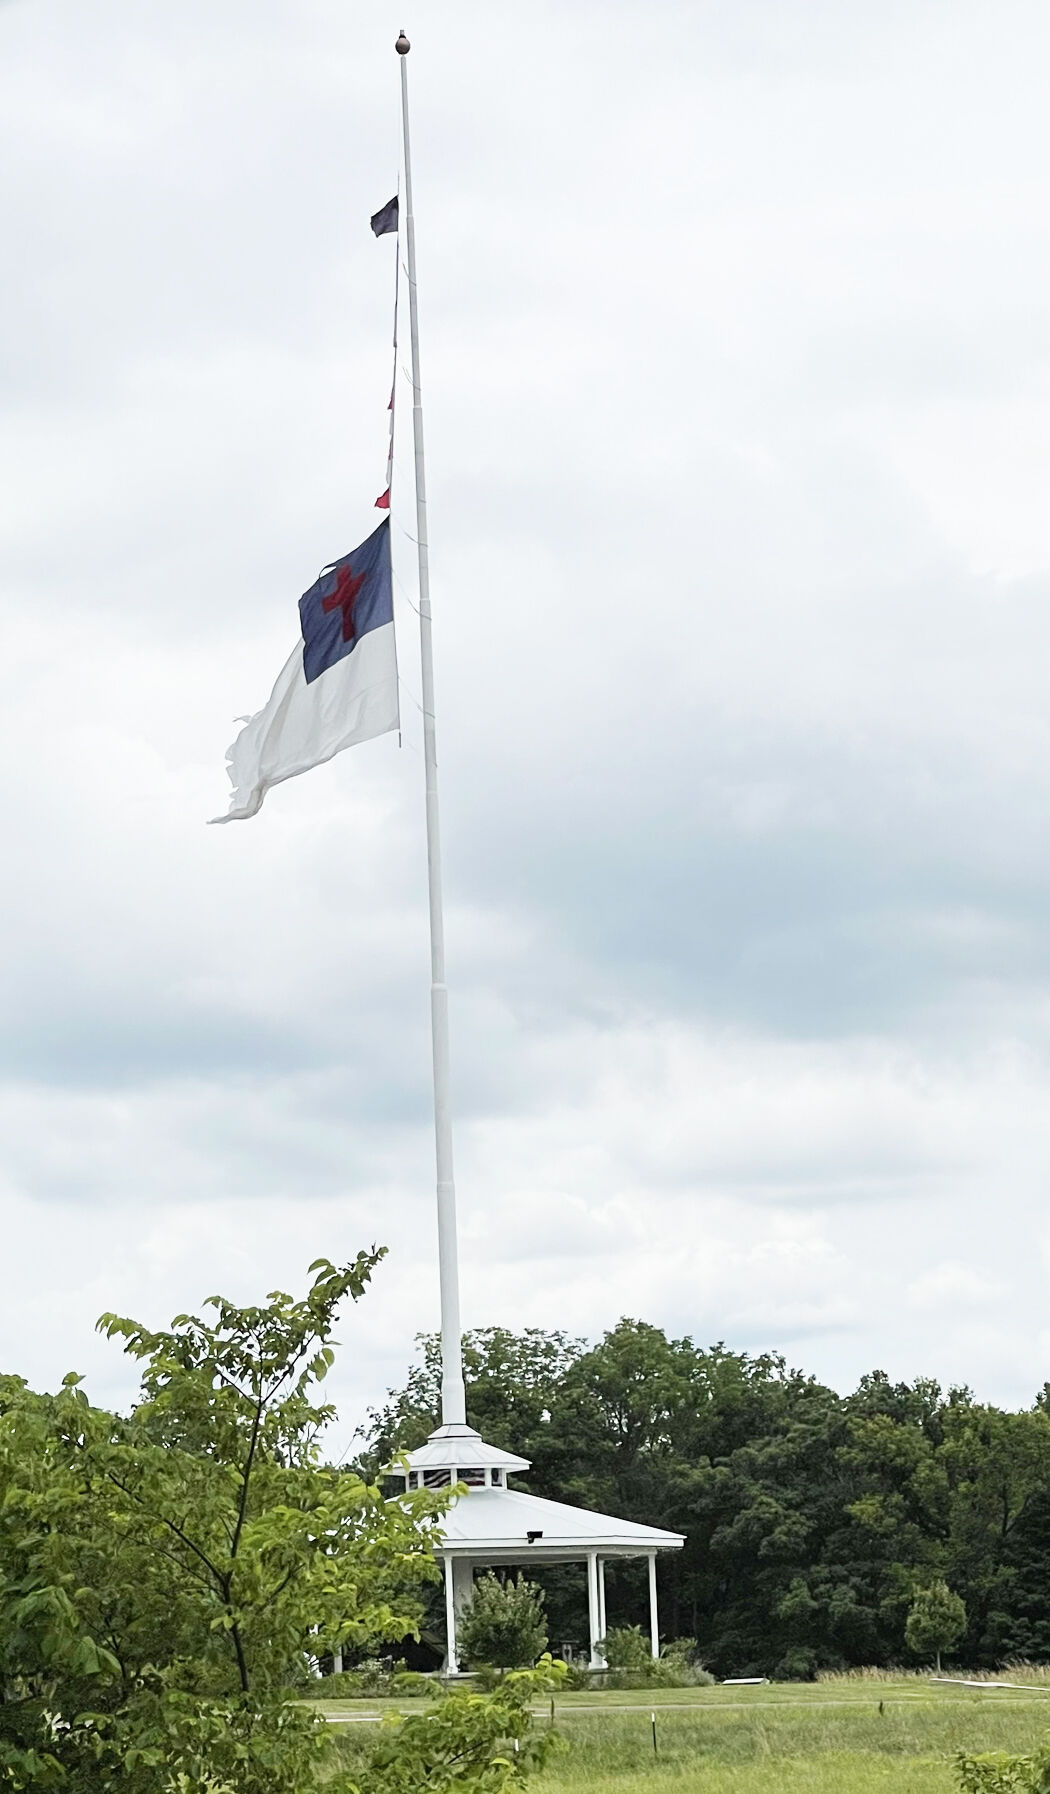 Missing US flag